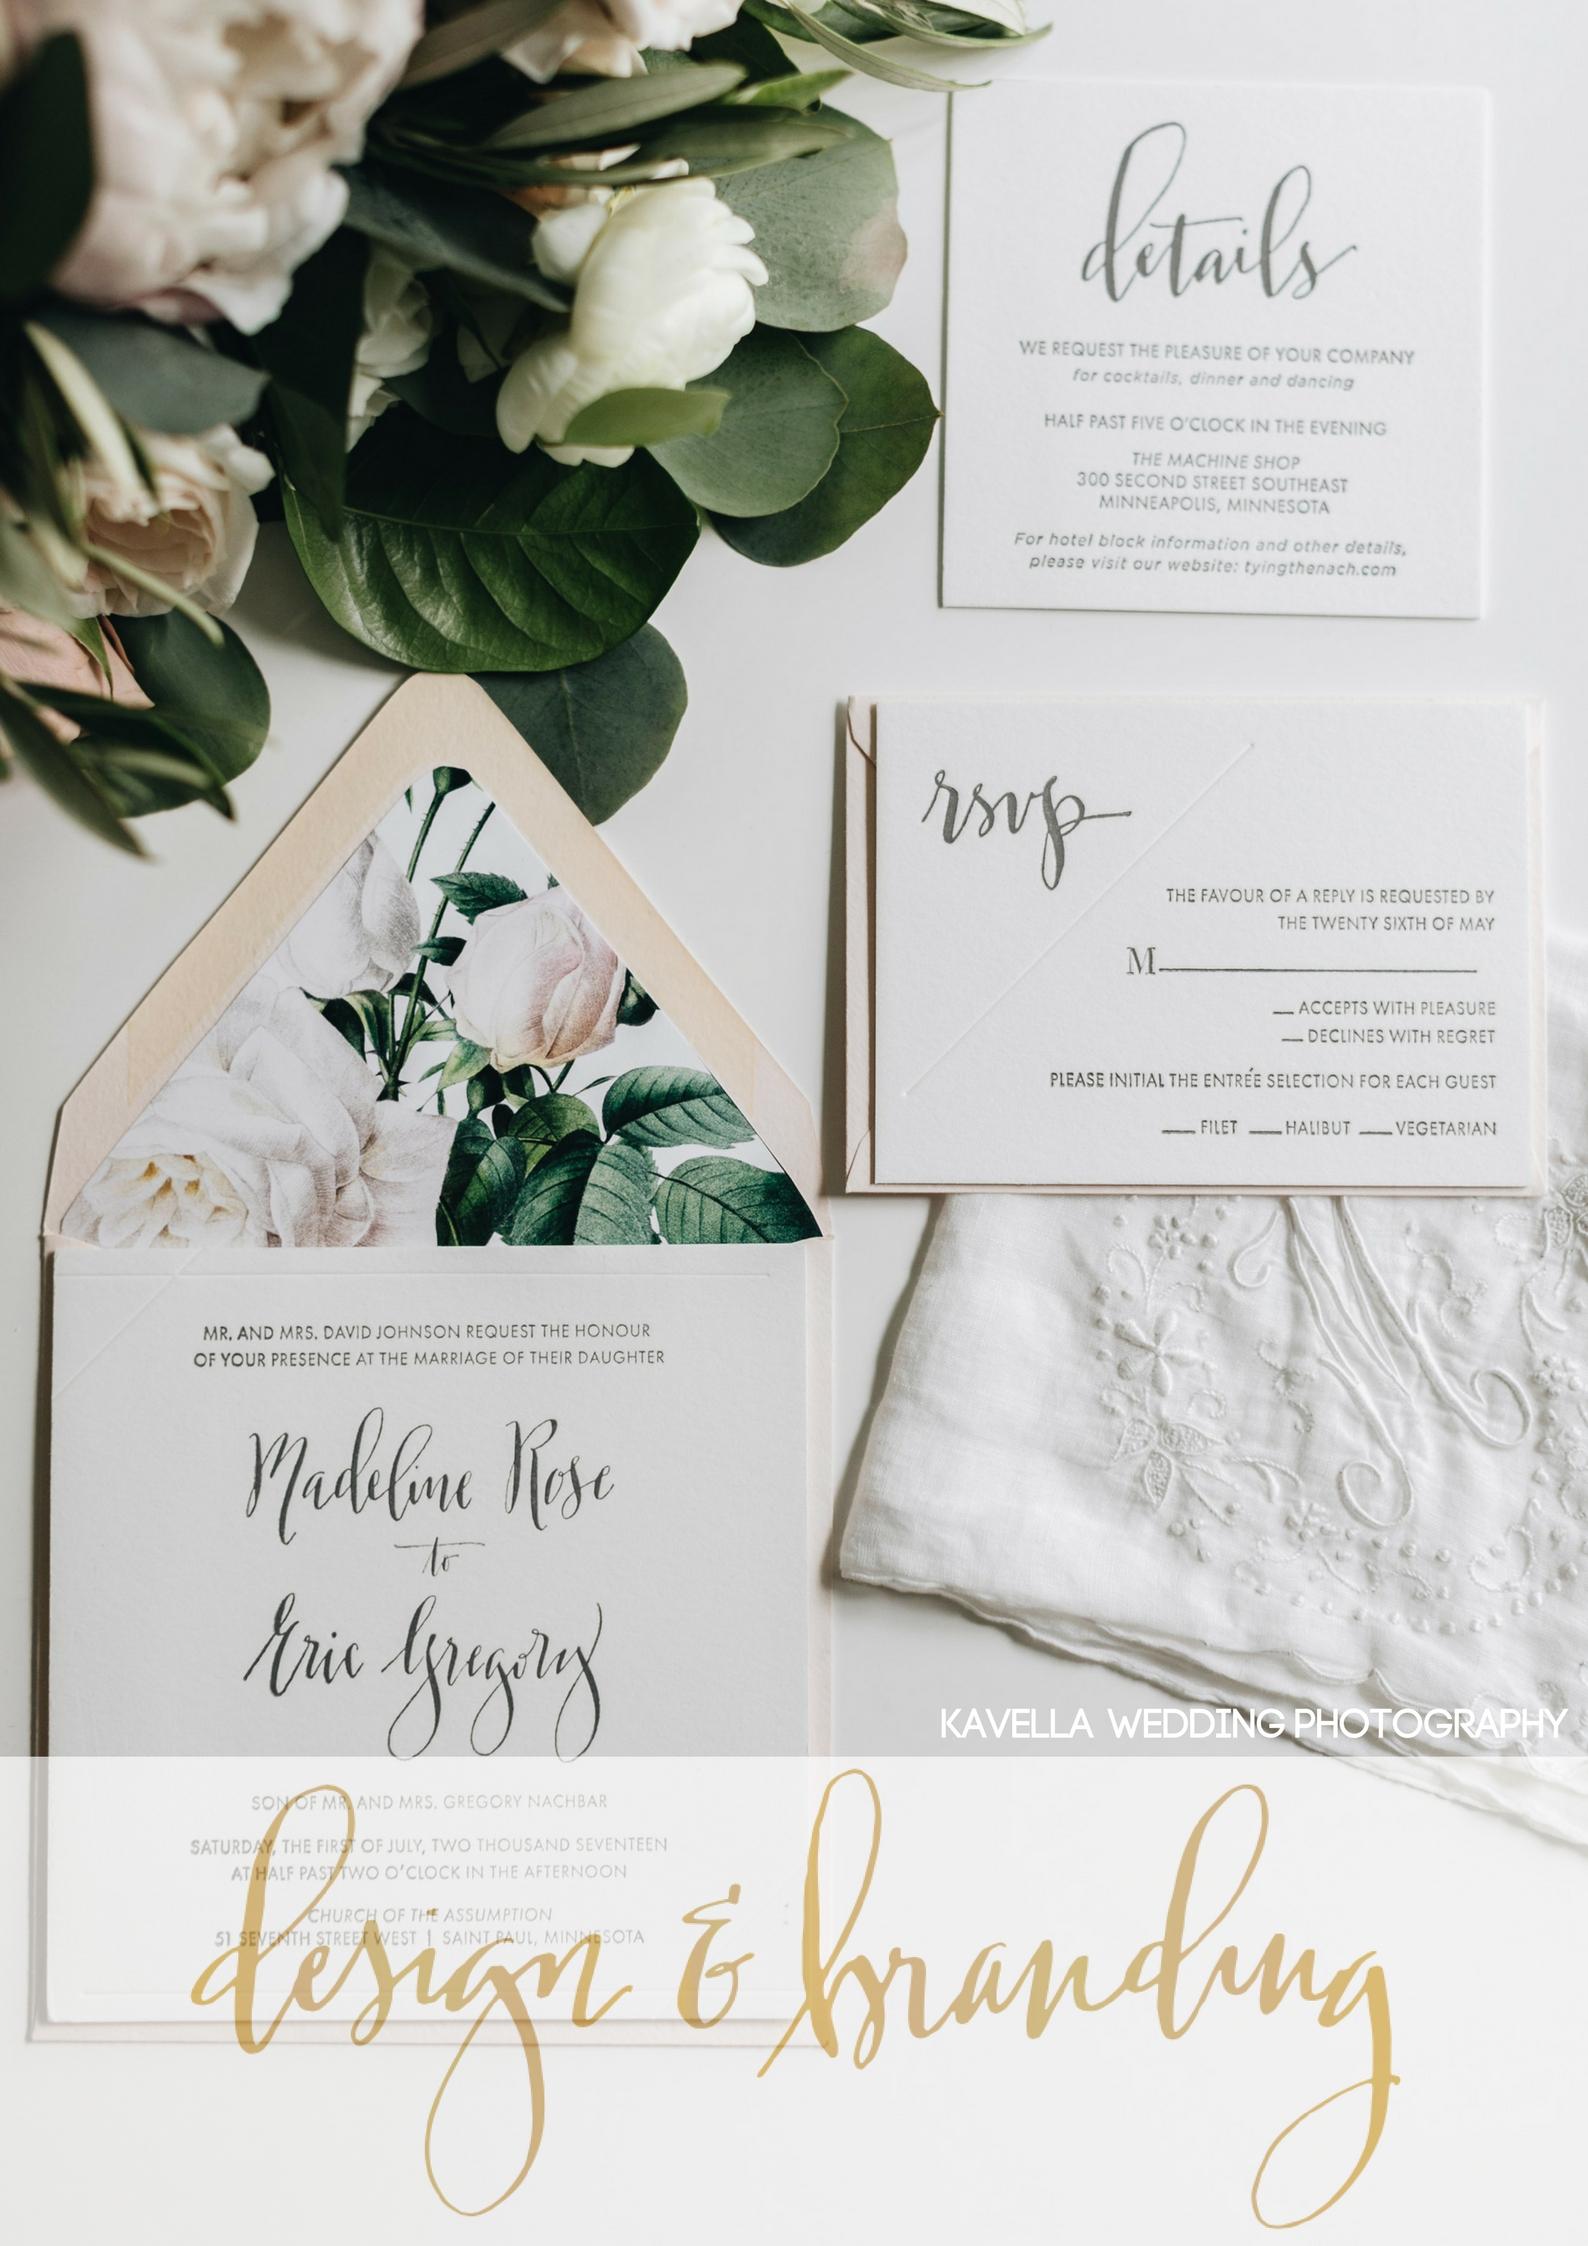 Minneapolis Wedding Planner Design and Branding.jpg